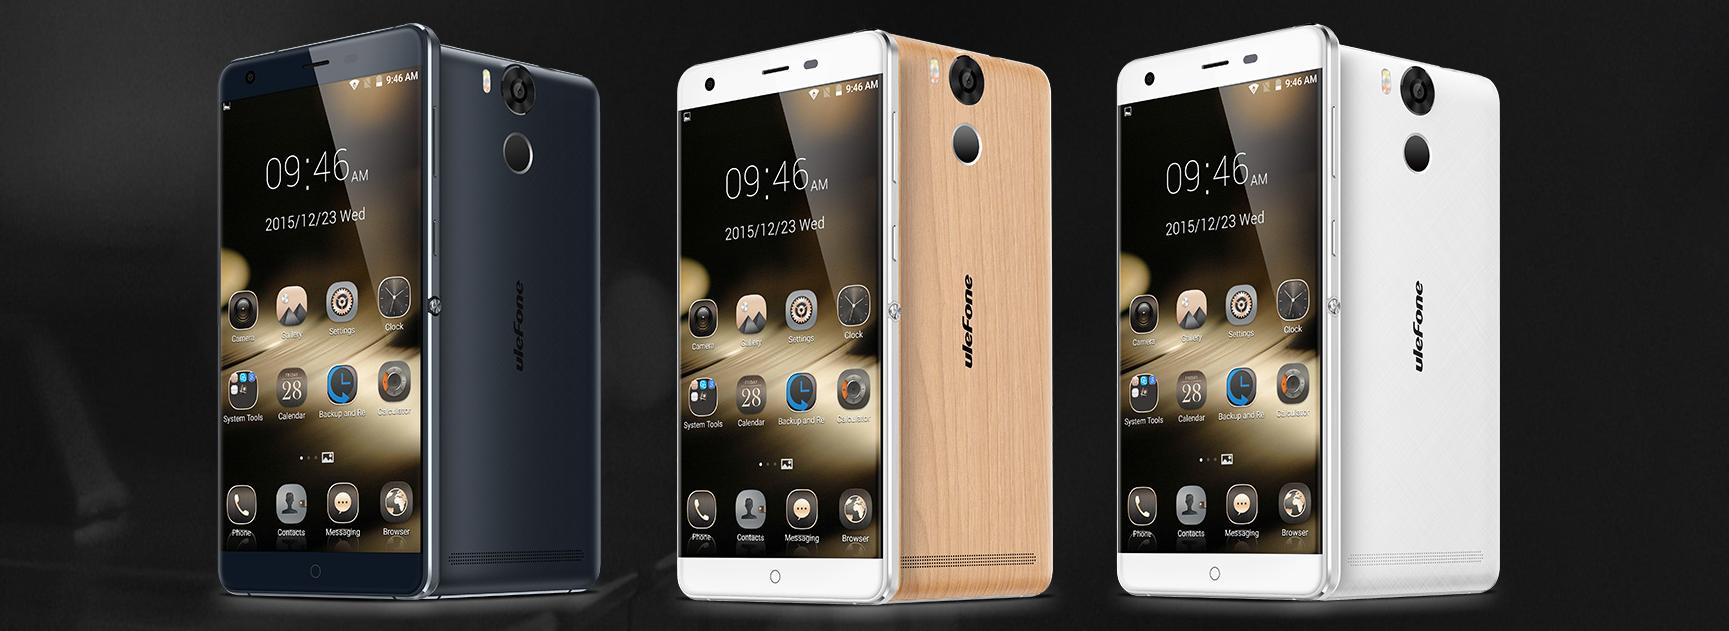 Ulefone Power – české LTE, Android 5.1 a obrovská baterie [sponzorovaný článek]